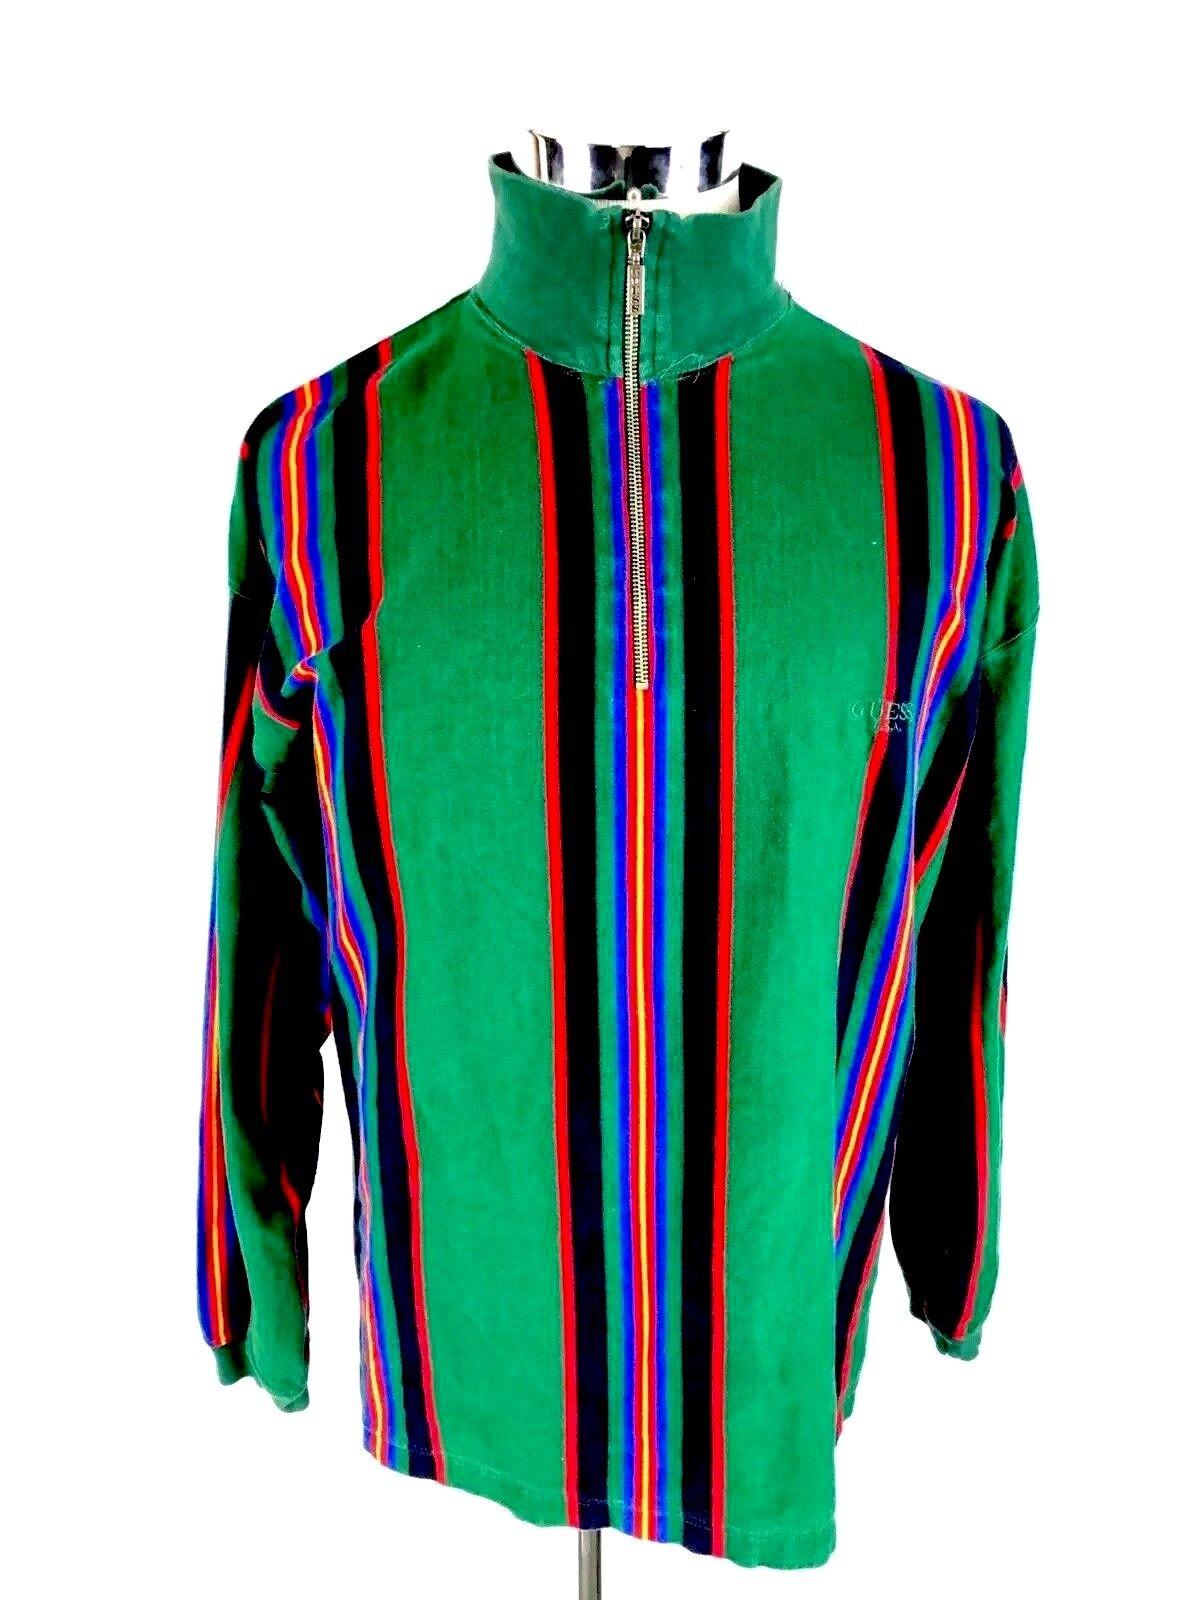 Guess Georges Marciano  Herren Pullover 1/2 Zip Sweatshirt L Large 80's Grün Rare